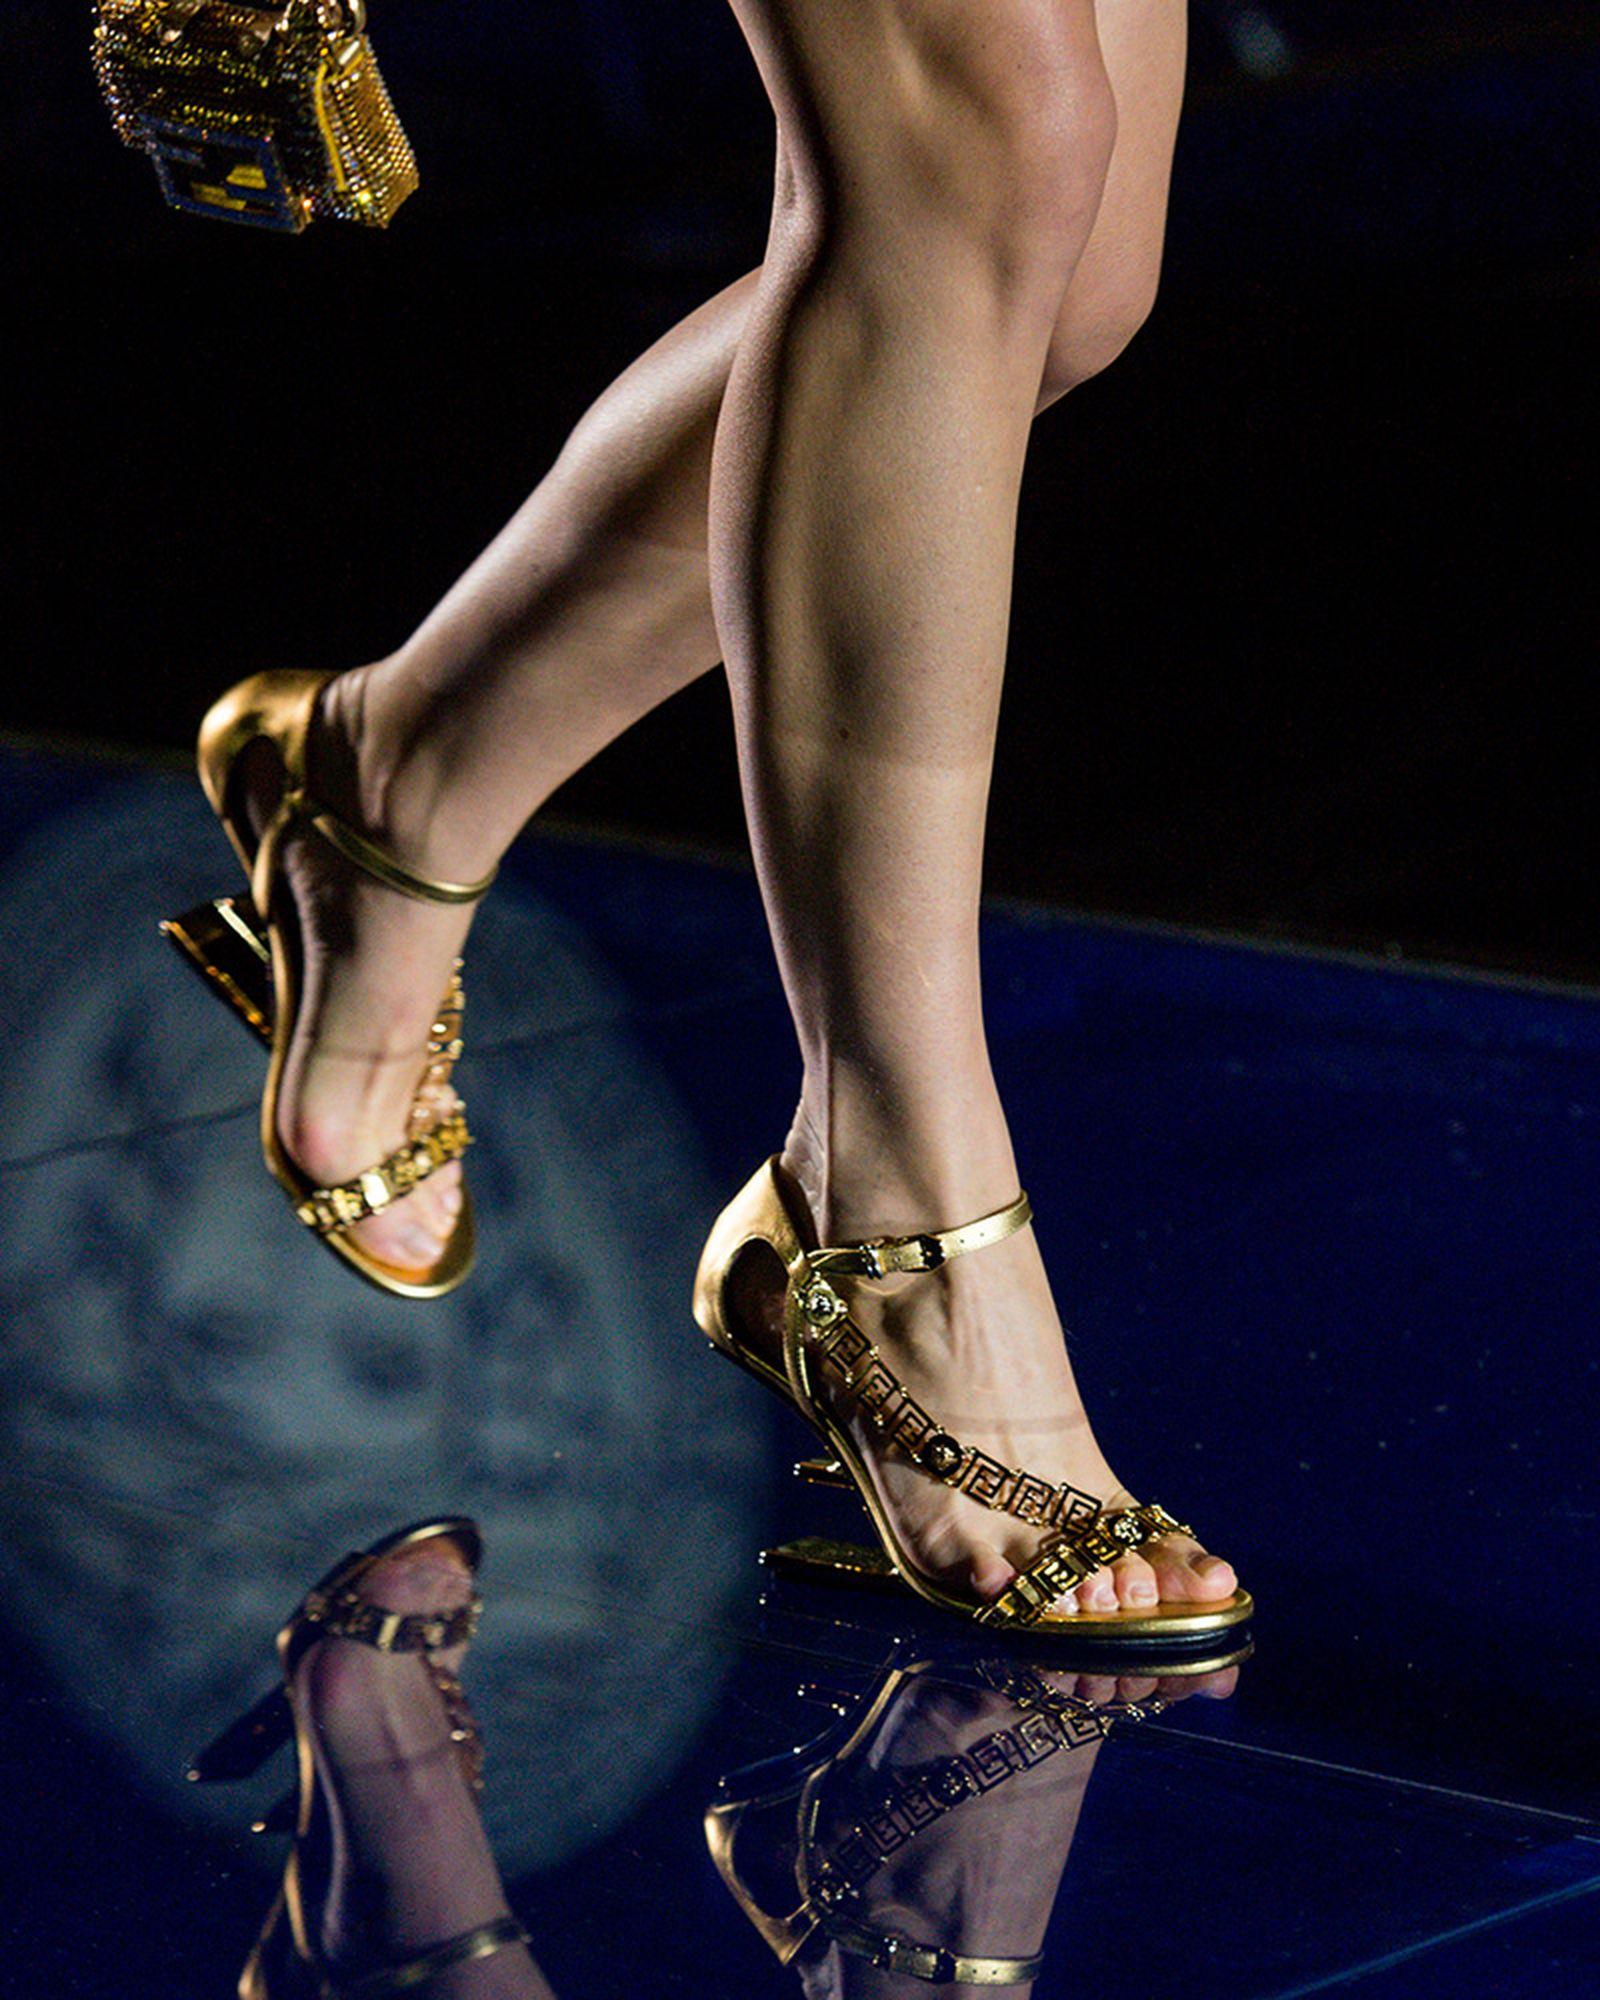 fashion-week-ss22-sneaker-roundup-fenedi-versace-03